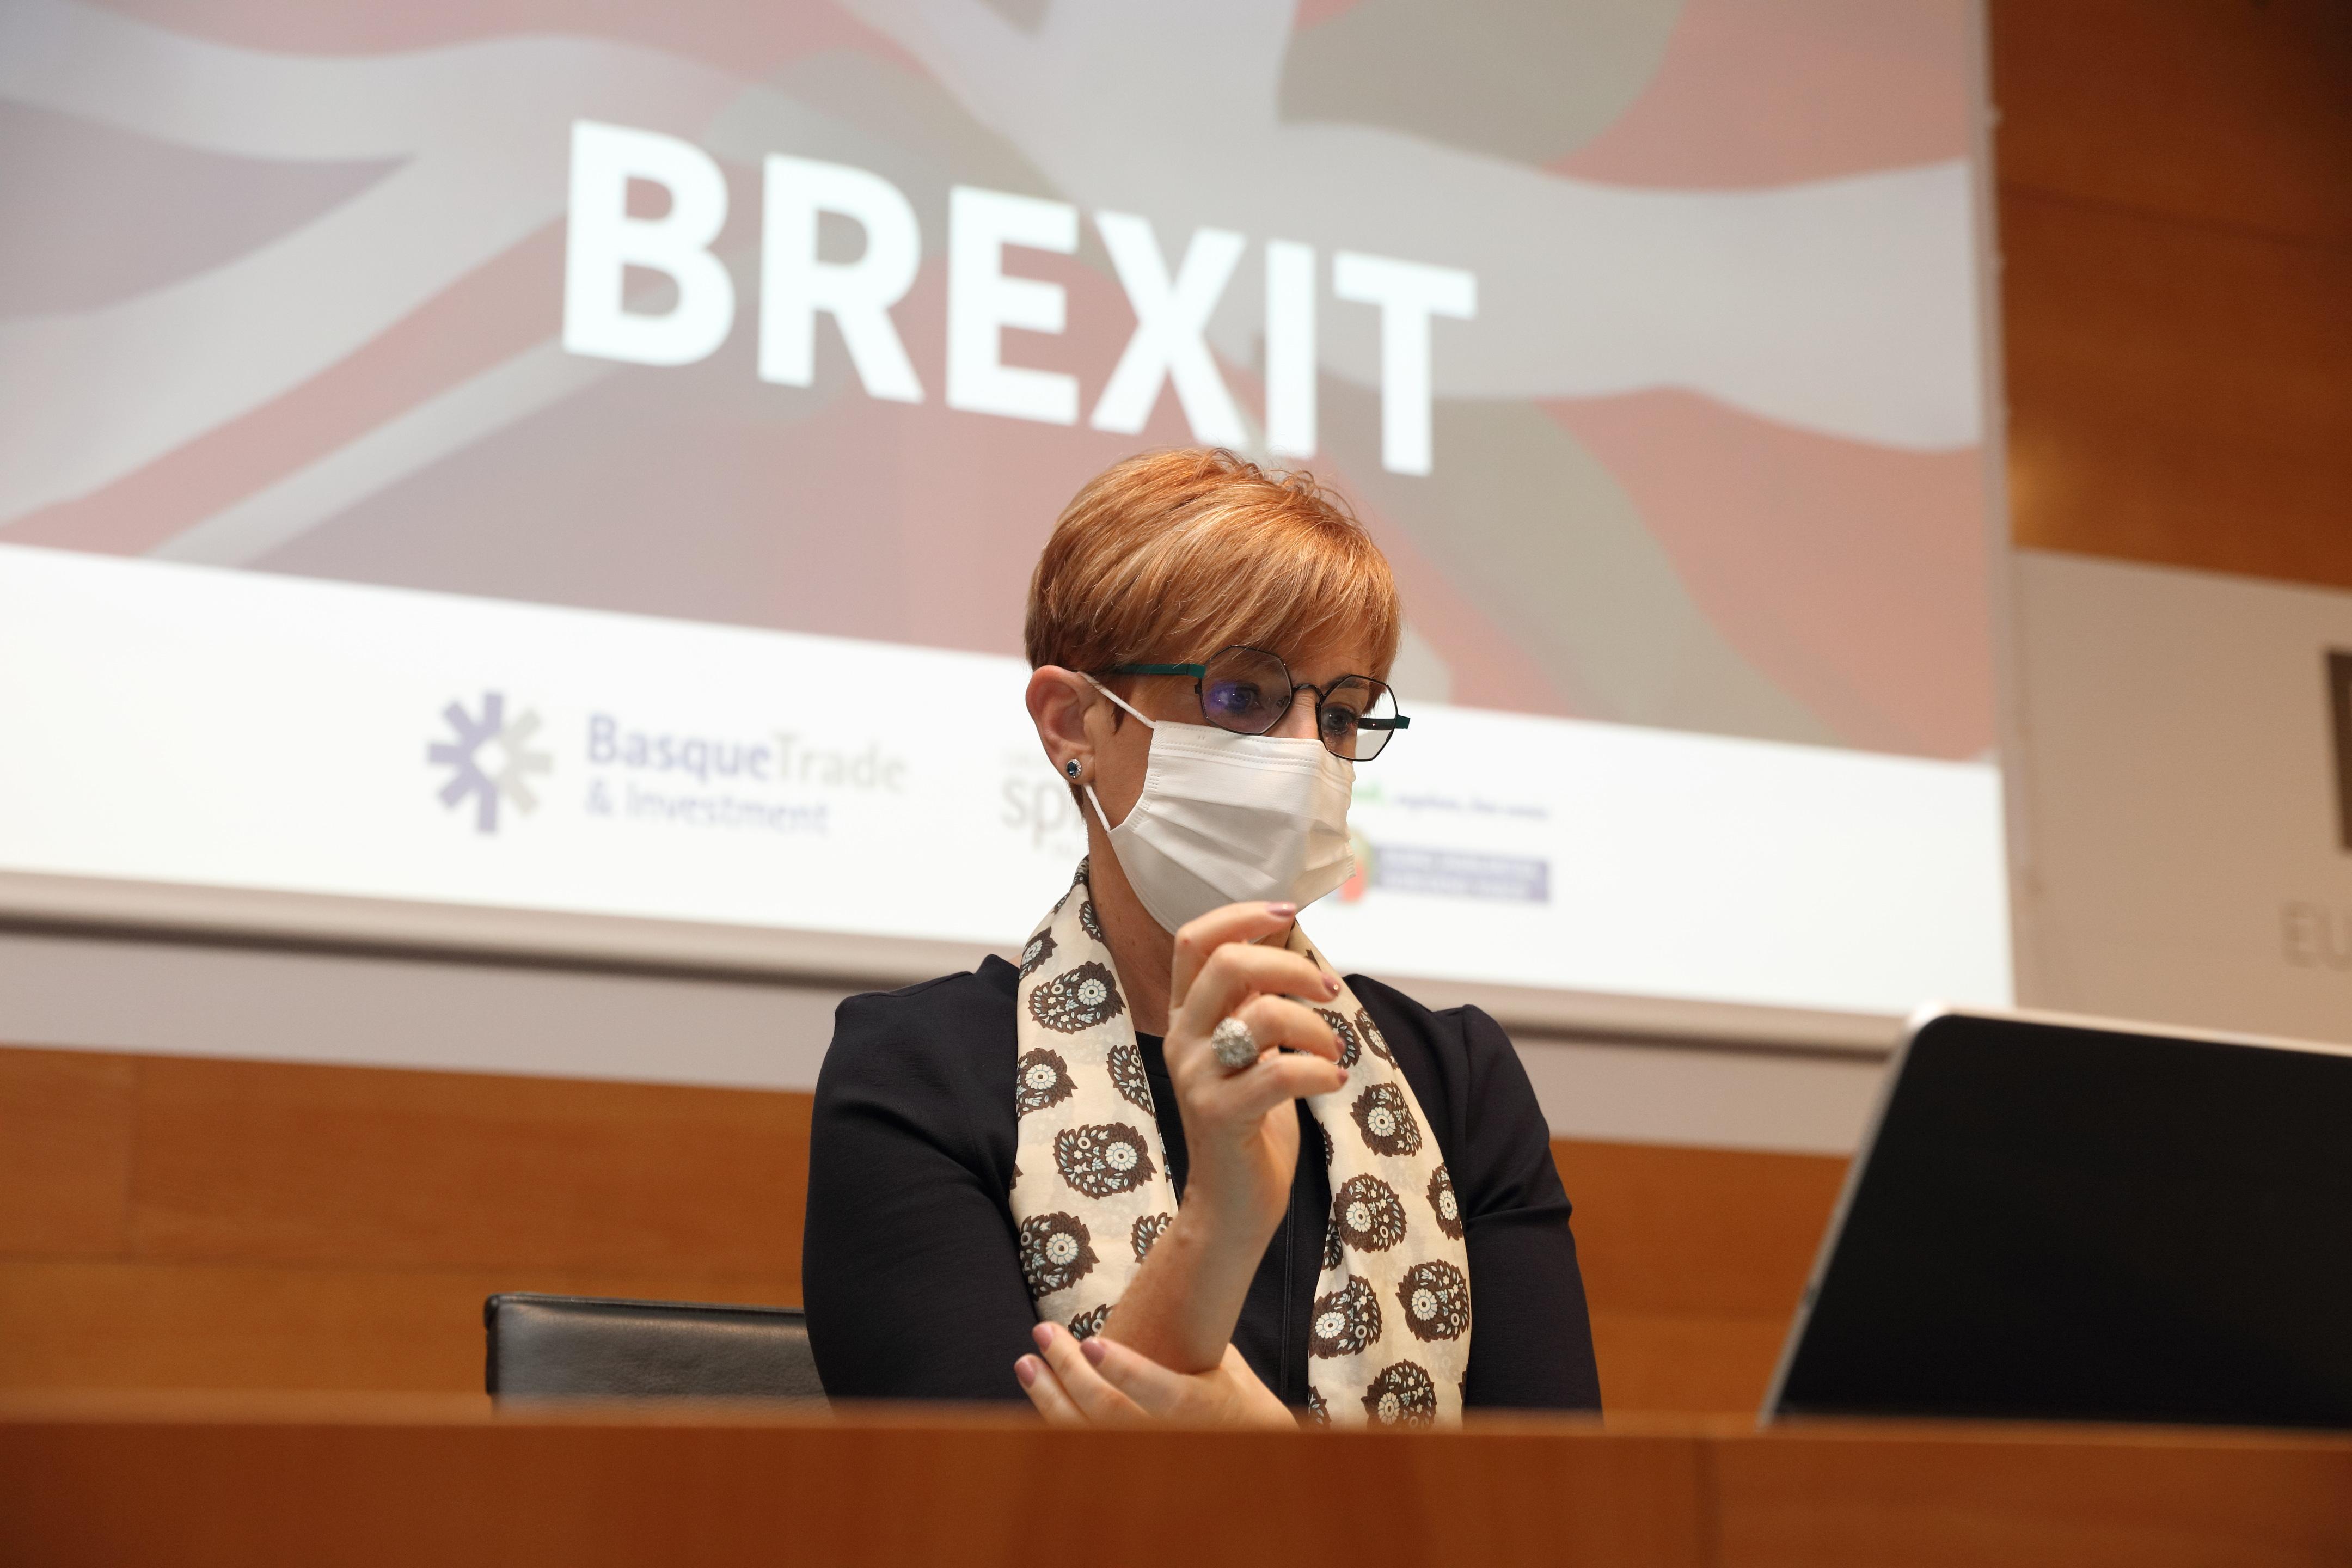 Brexit_007.JPG